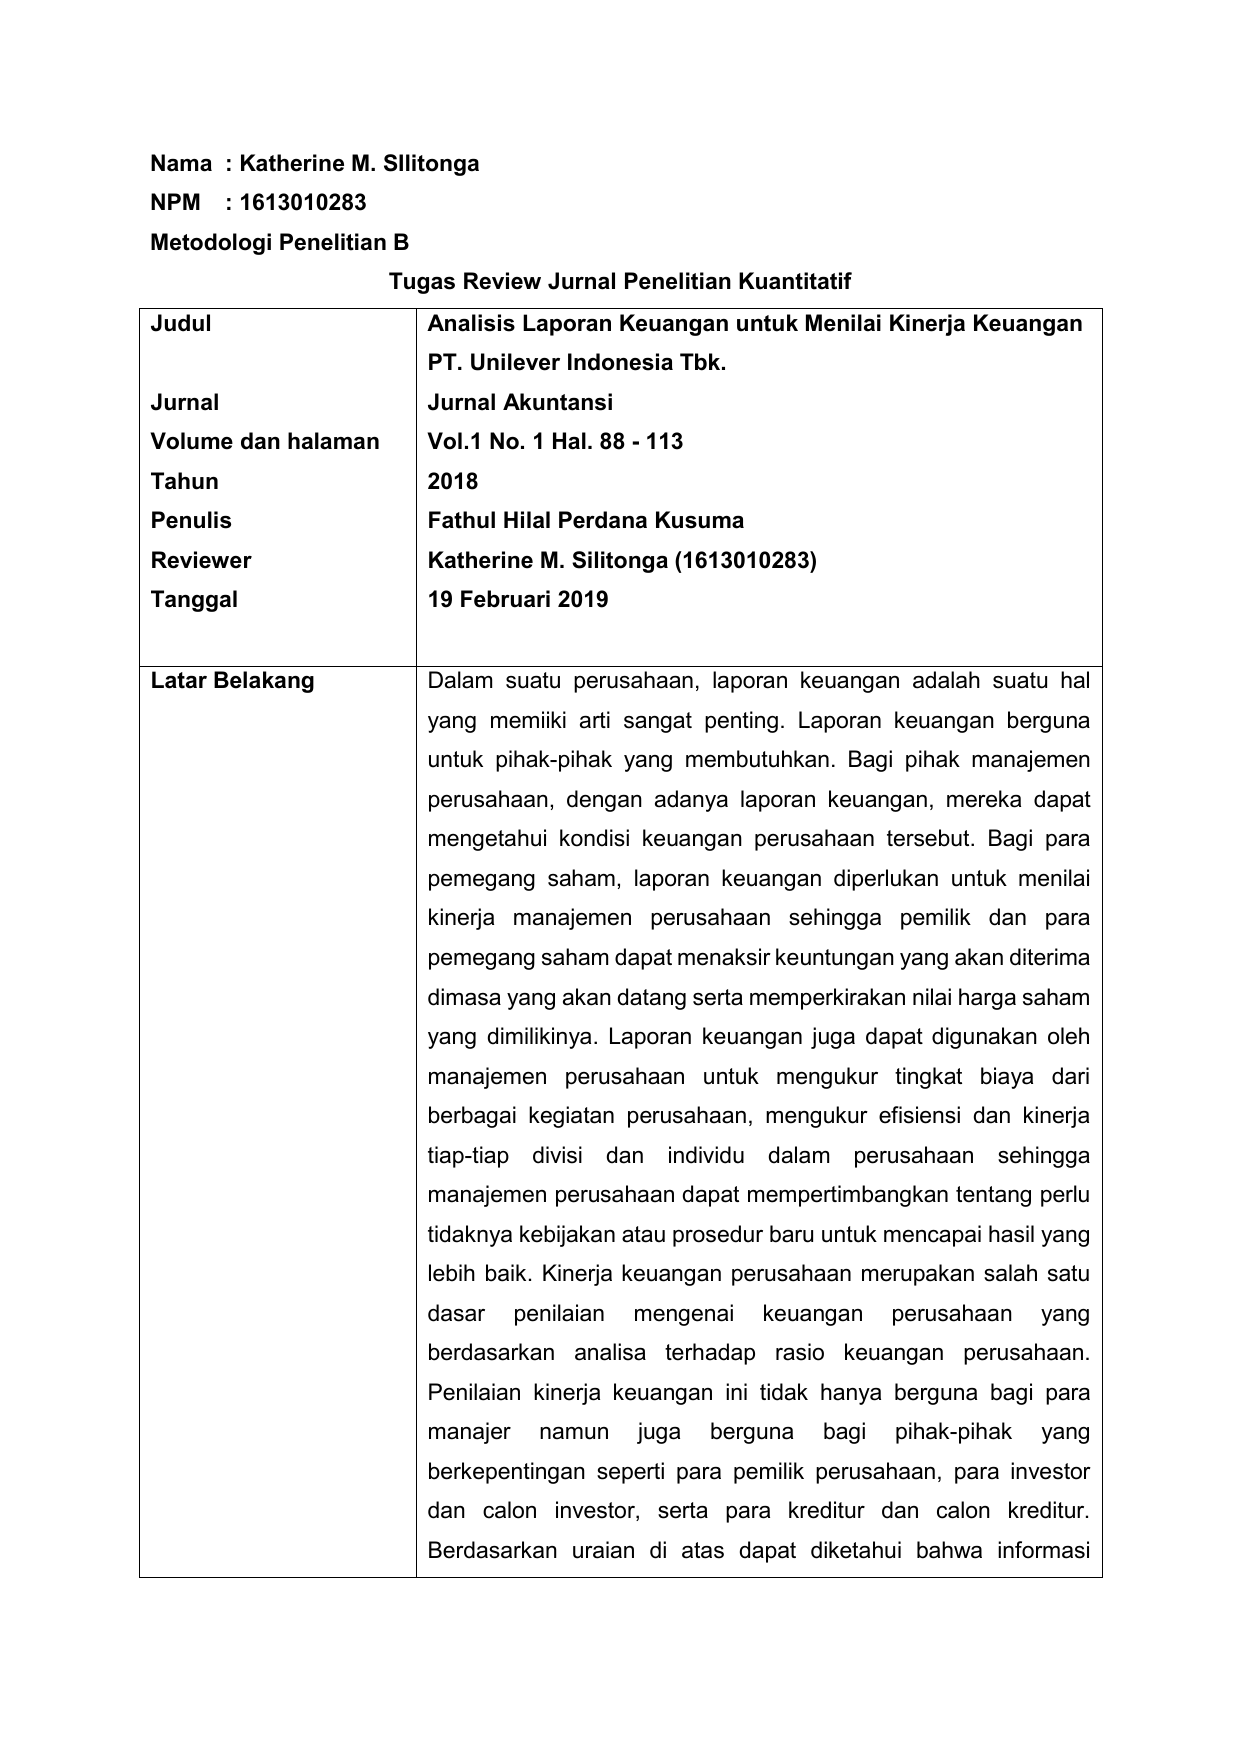 Contoh Jurnal Dan Worksheet Printable Worksheets And Activities For Teachers Parents Tutors And Homeschool Families